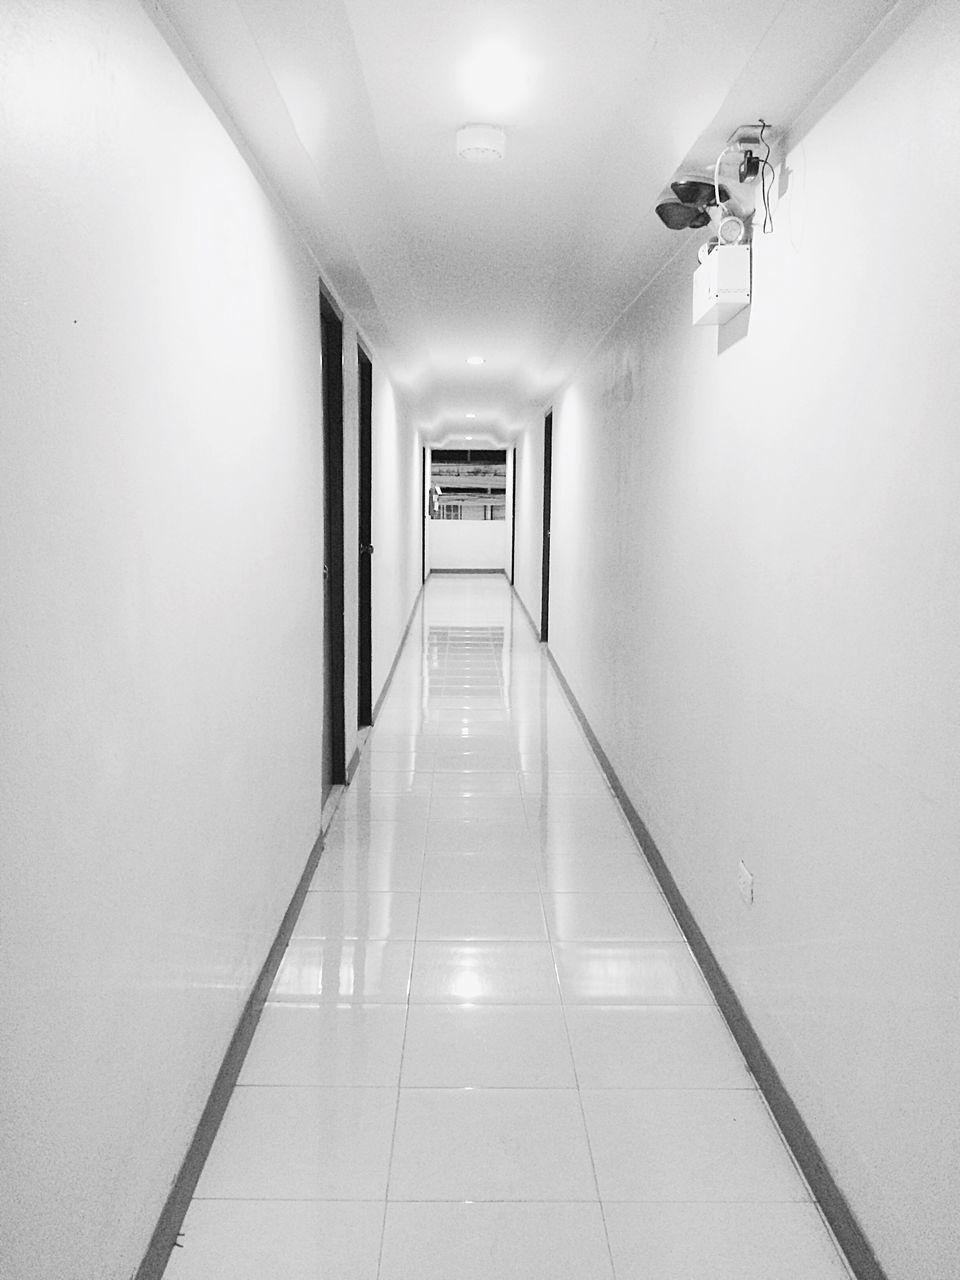 lighting equipment, indoors, illuminated, corridor, the way forward, no people, architecture, hospital, prison, day